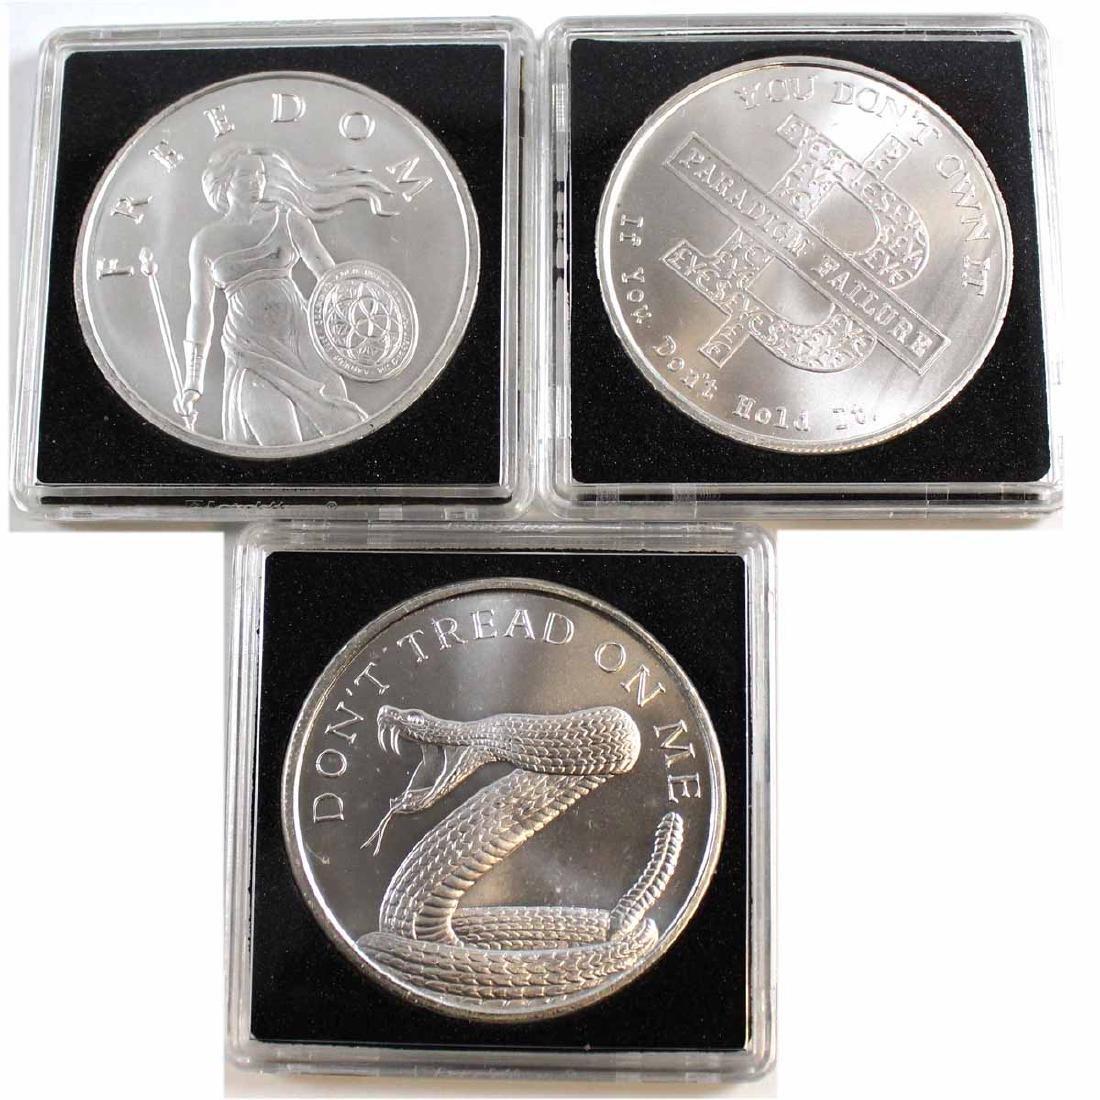 Silver Shield 1oz Fine Silver Coin Lot (Tax Exempt).